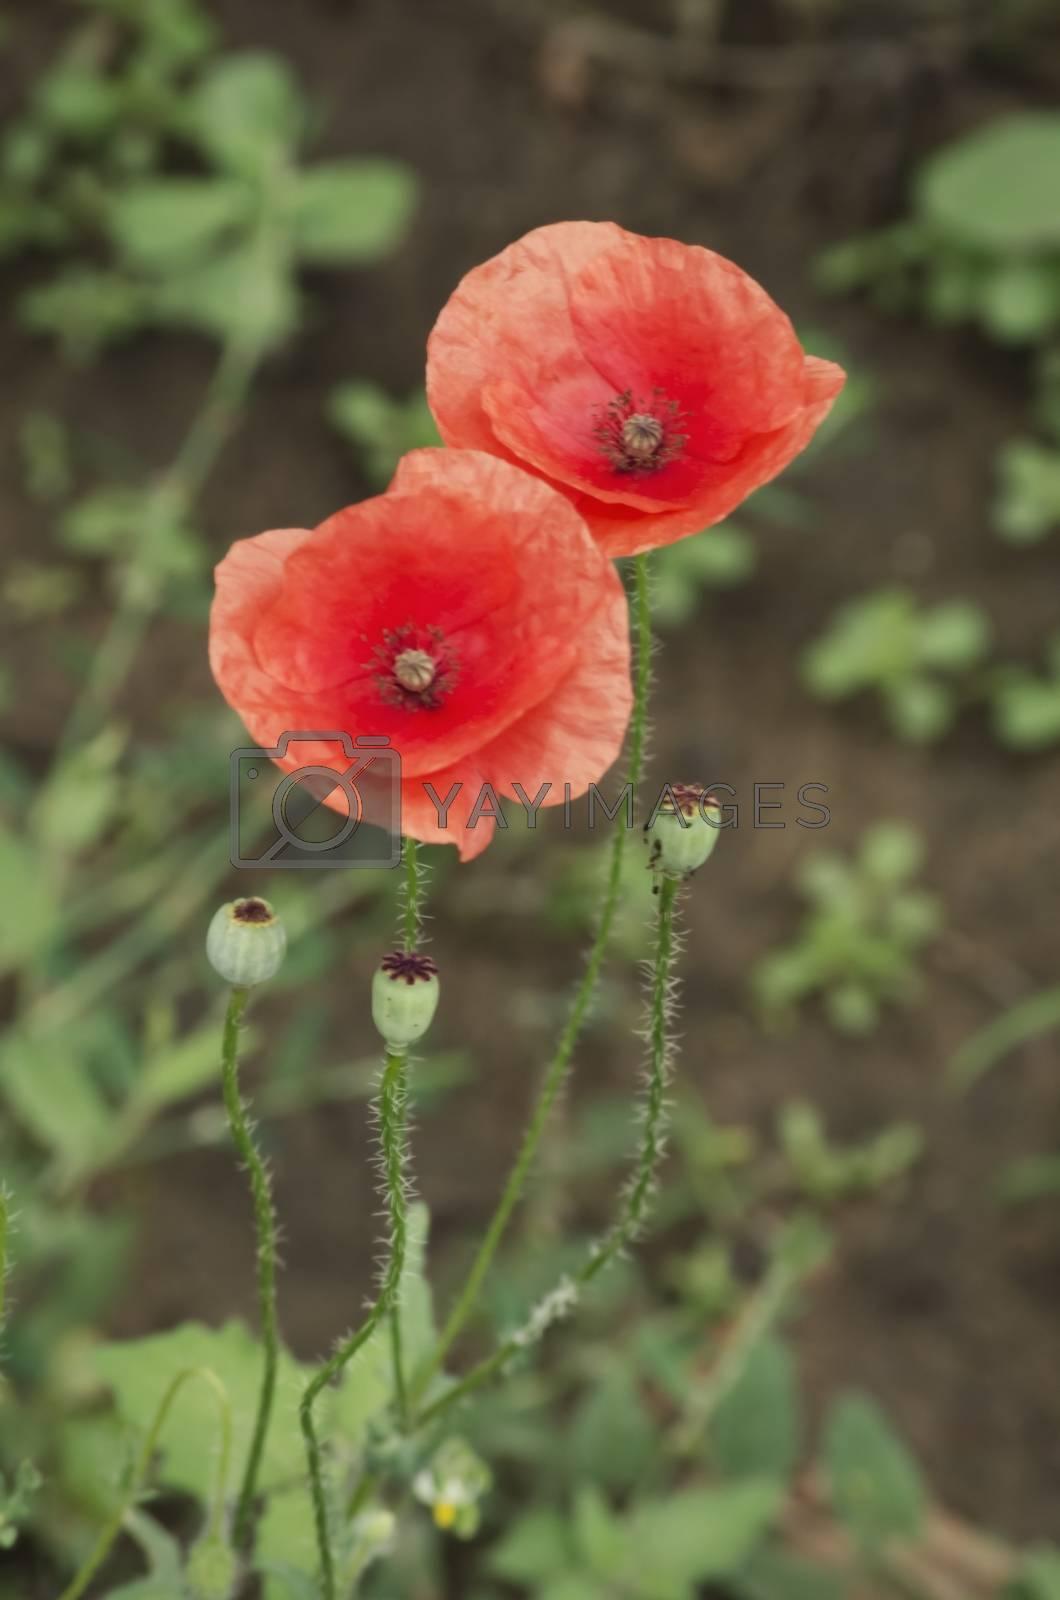 Photo of Red Poppy Flower Over Green Grass in Springtime